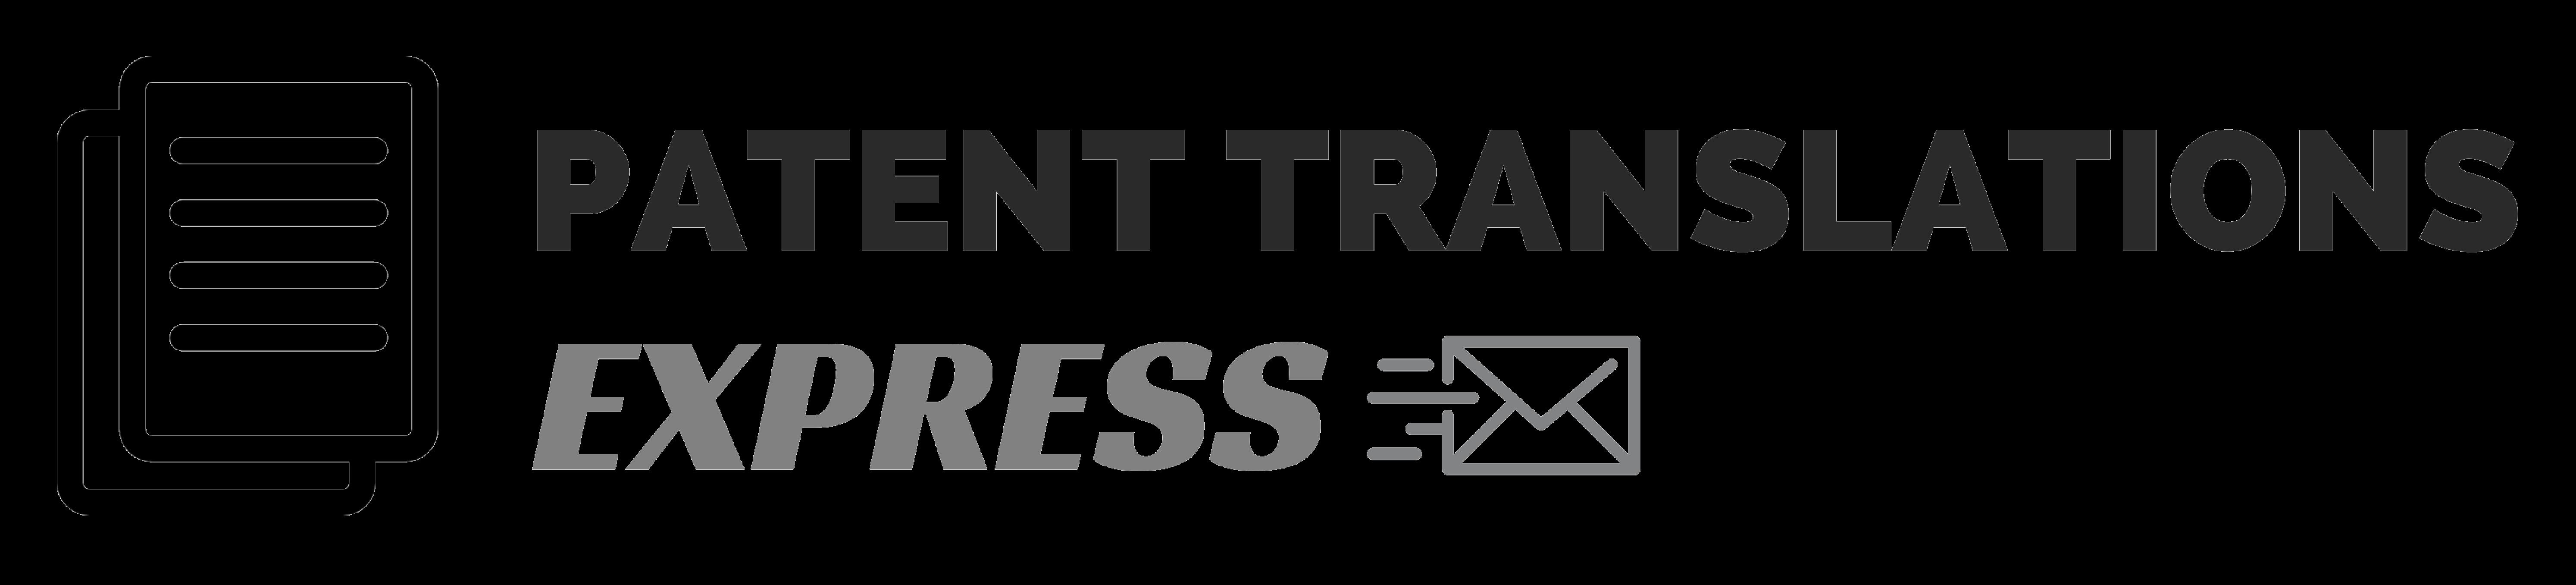 Patent Translations Express